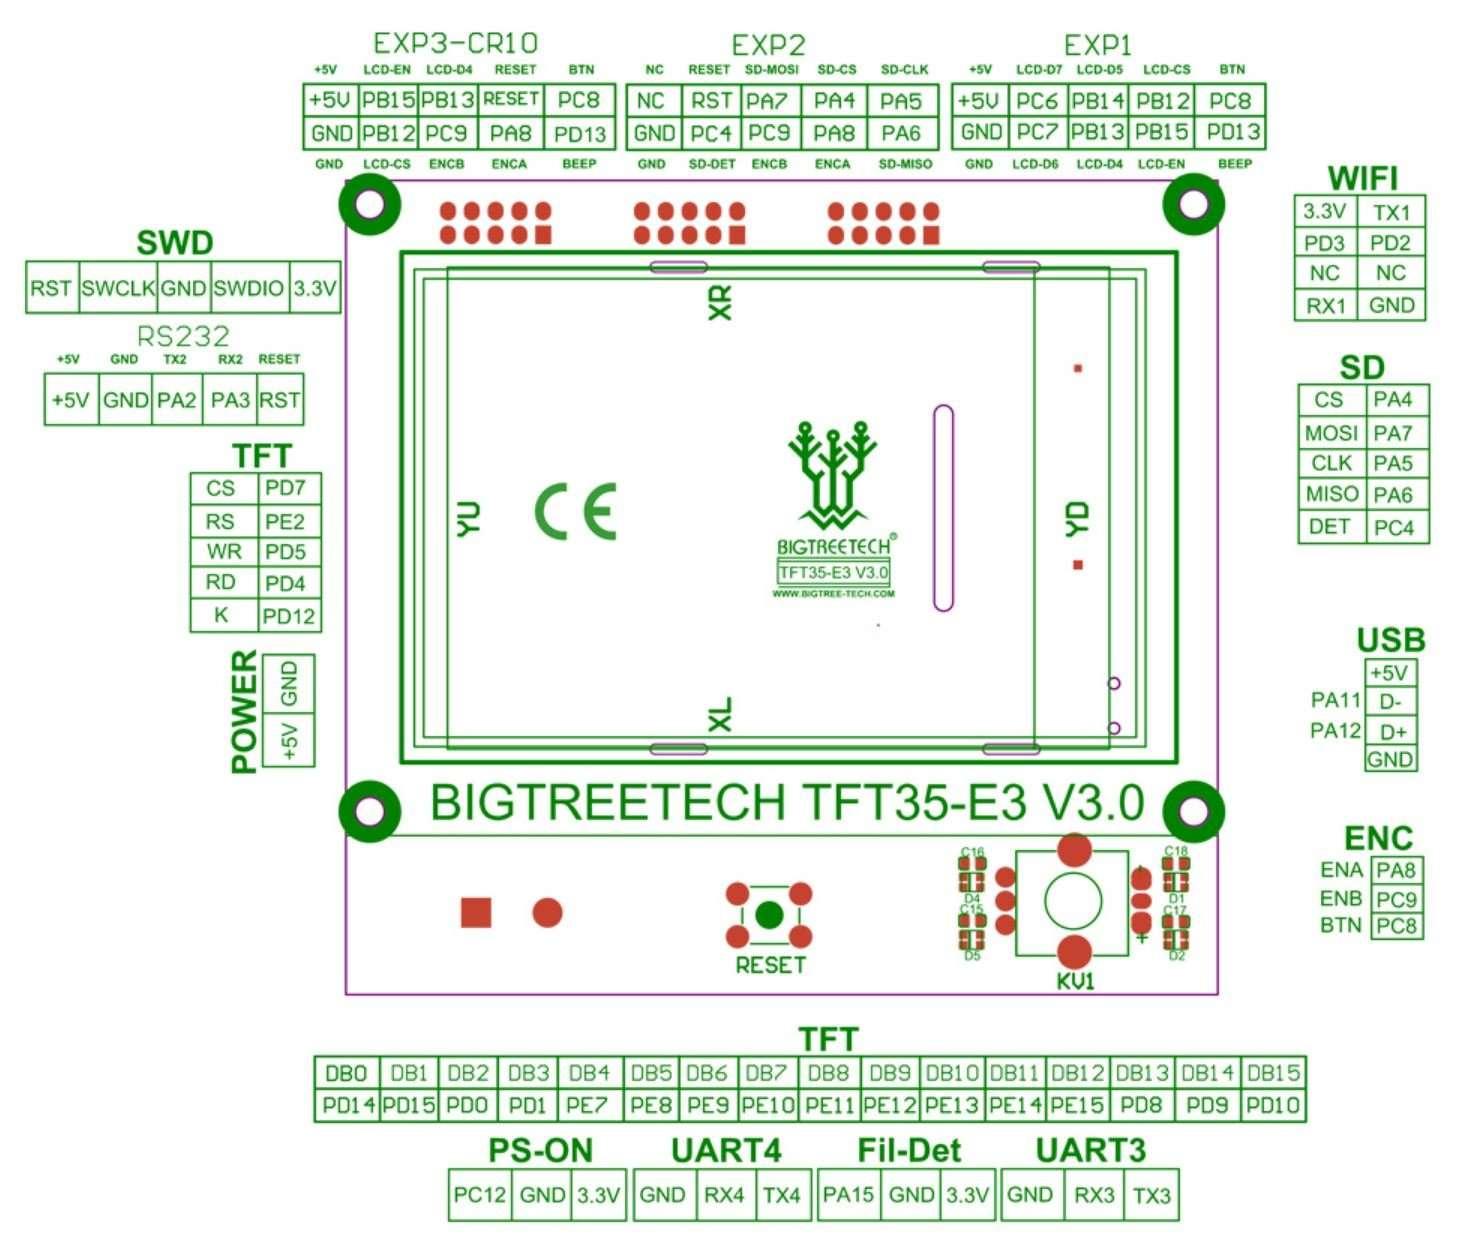 bigtreetech-TFT35-E3-v3.0-schematic